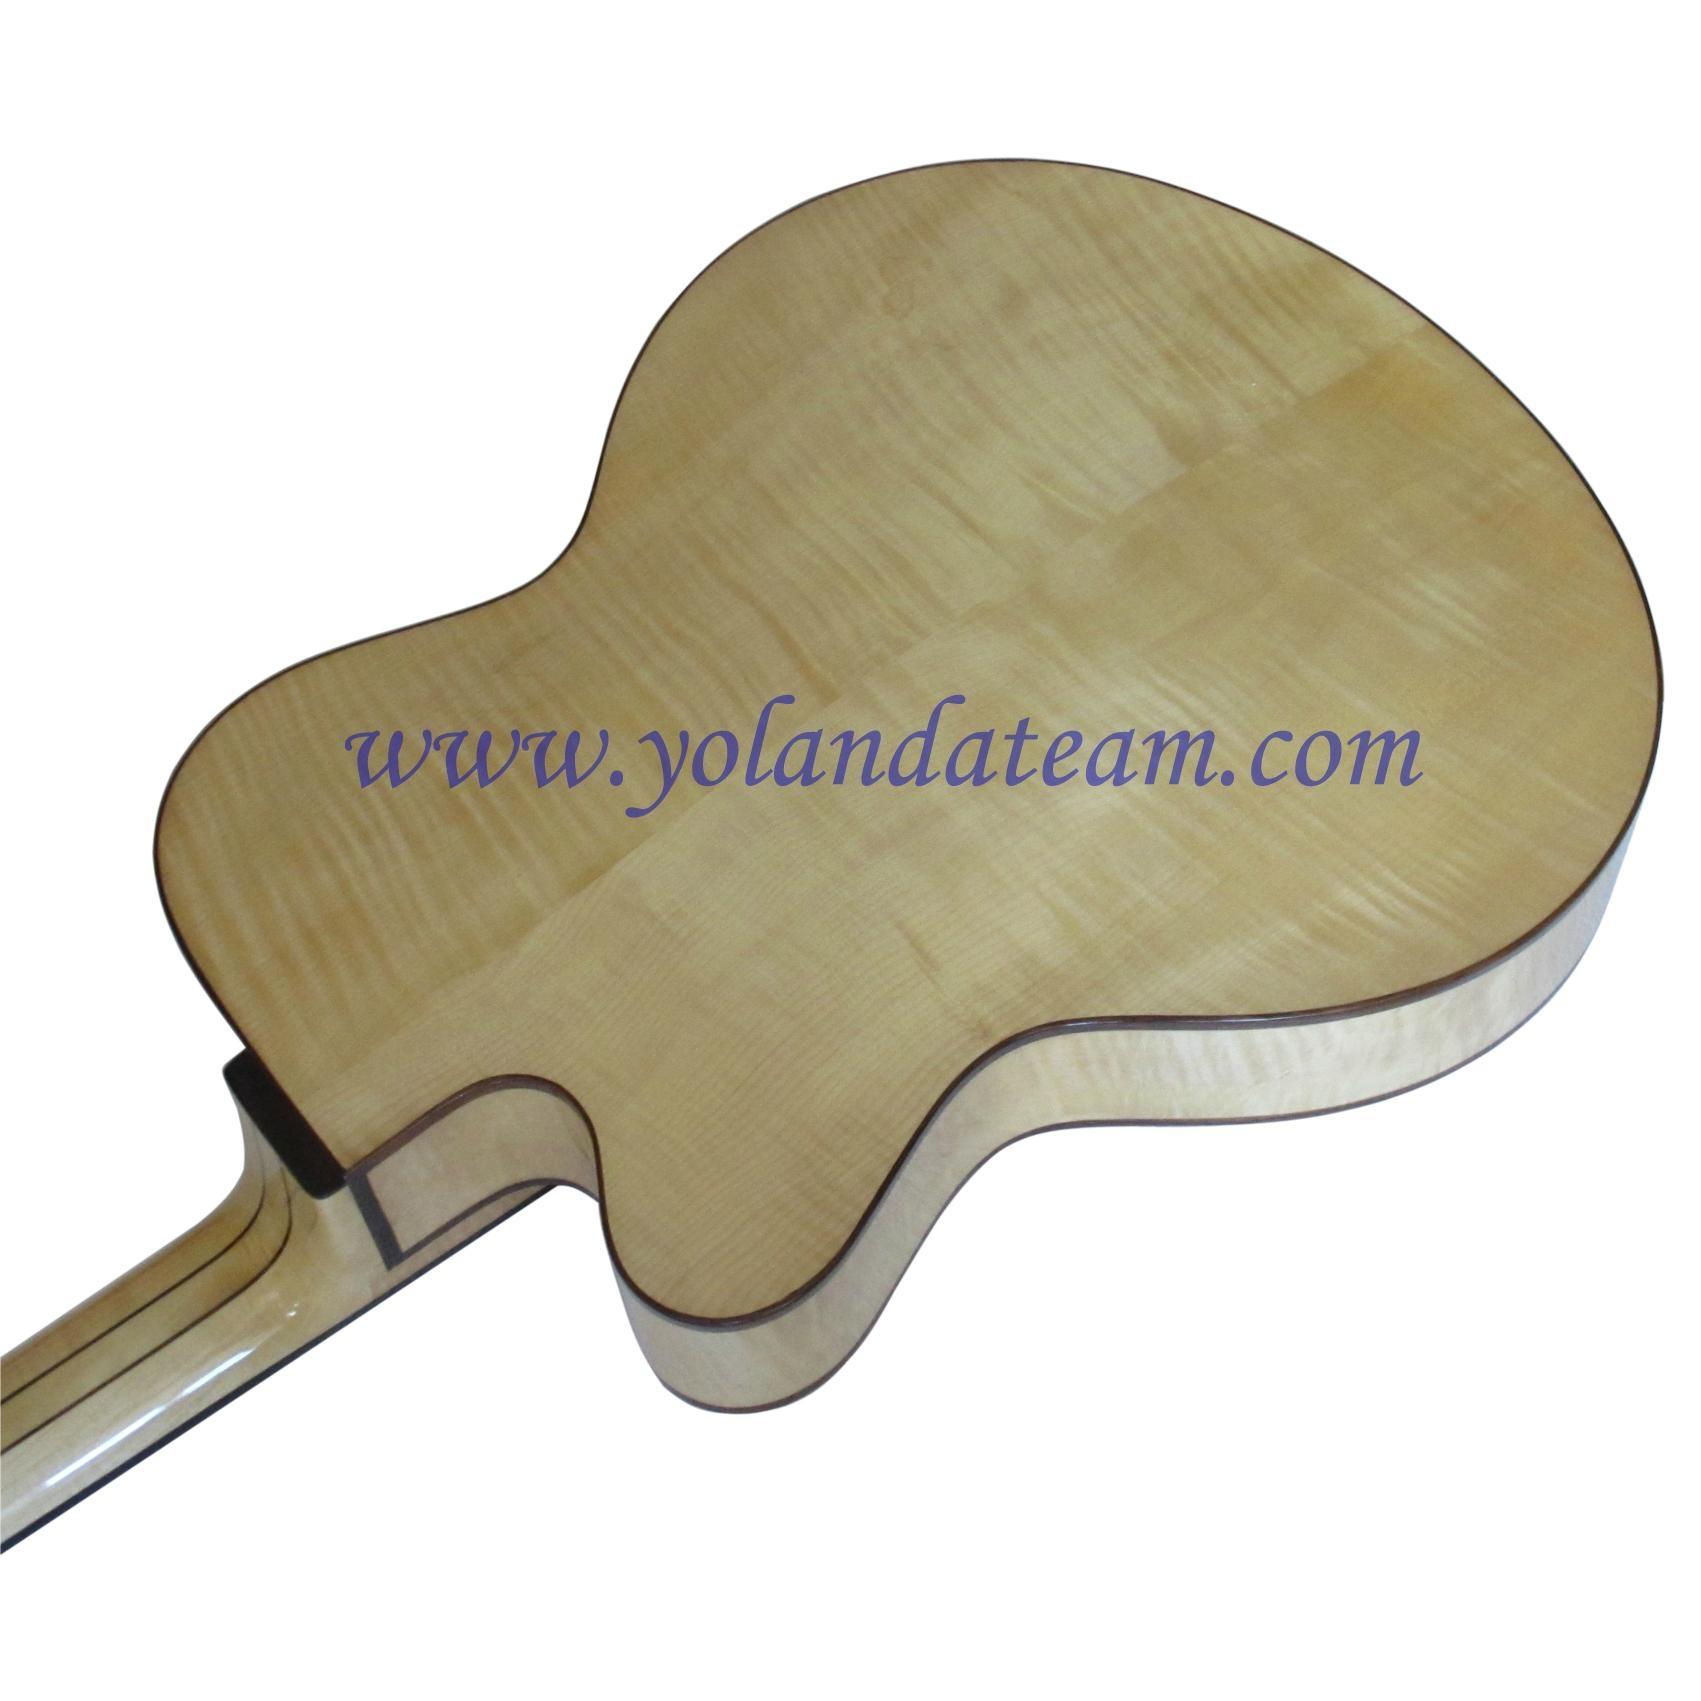 17inch handmade jazz guitar  6